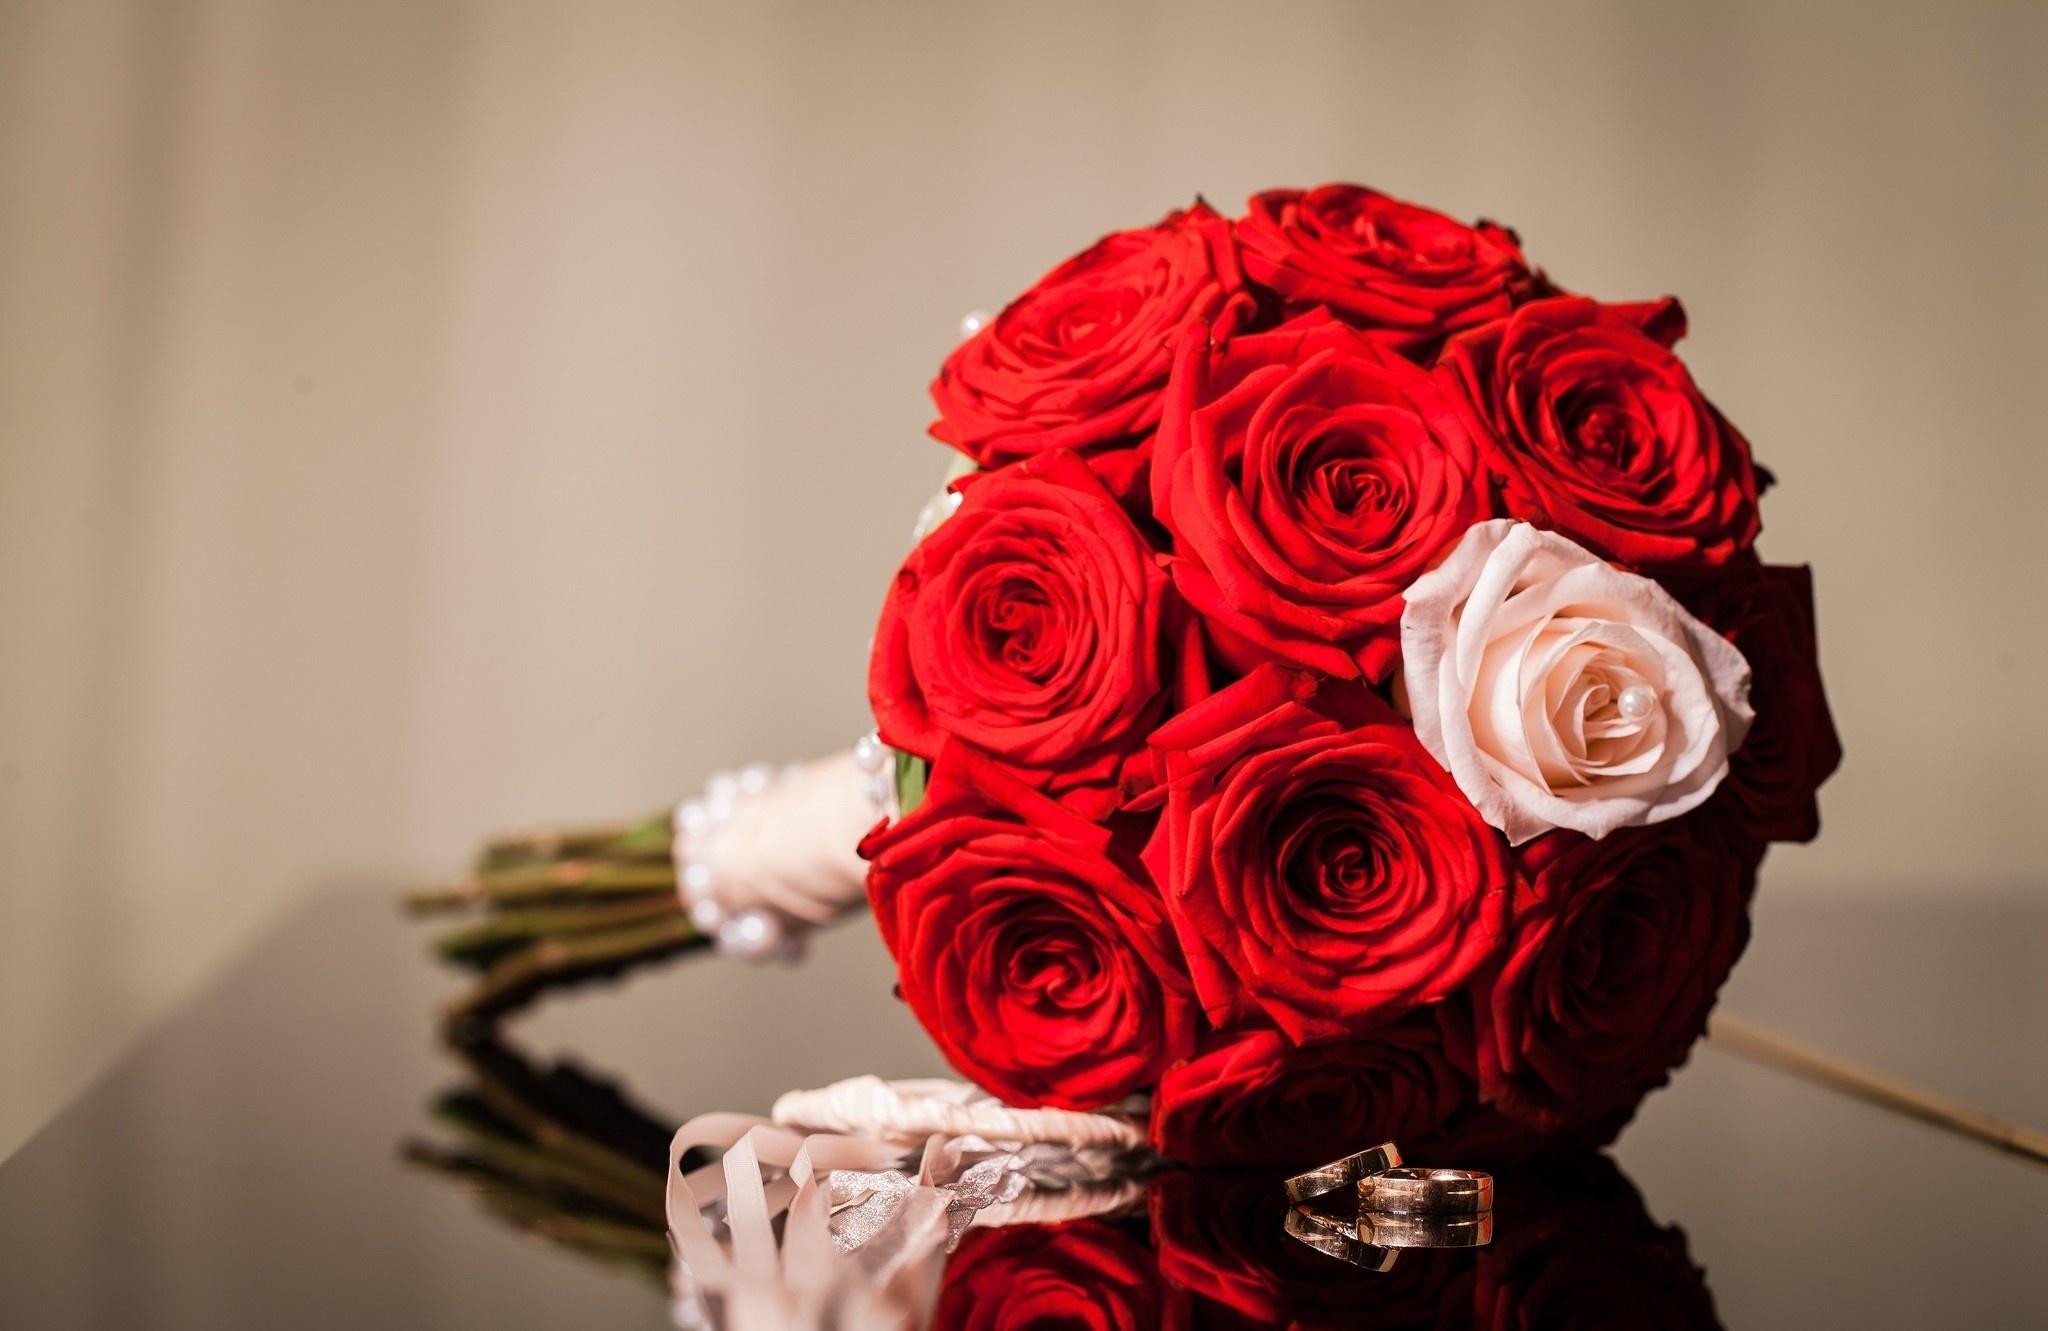 Wallpaper 2048x1331 Px Buket Bunga Bunga Merah Cincin Mawar 2048x1331 Goodfon 1743205 Hd Wallpapers Wallhere